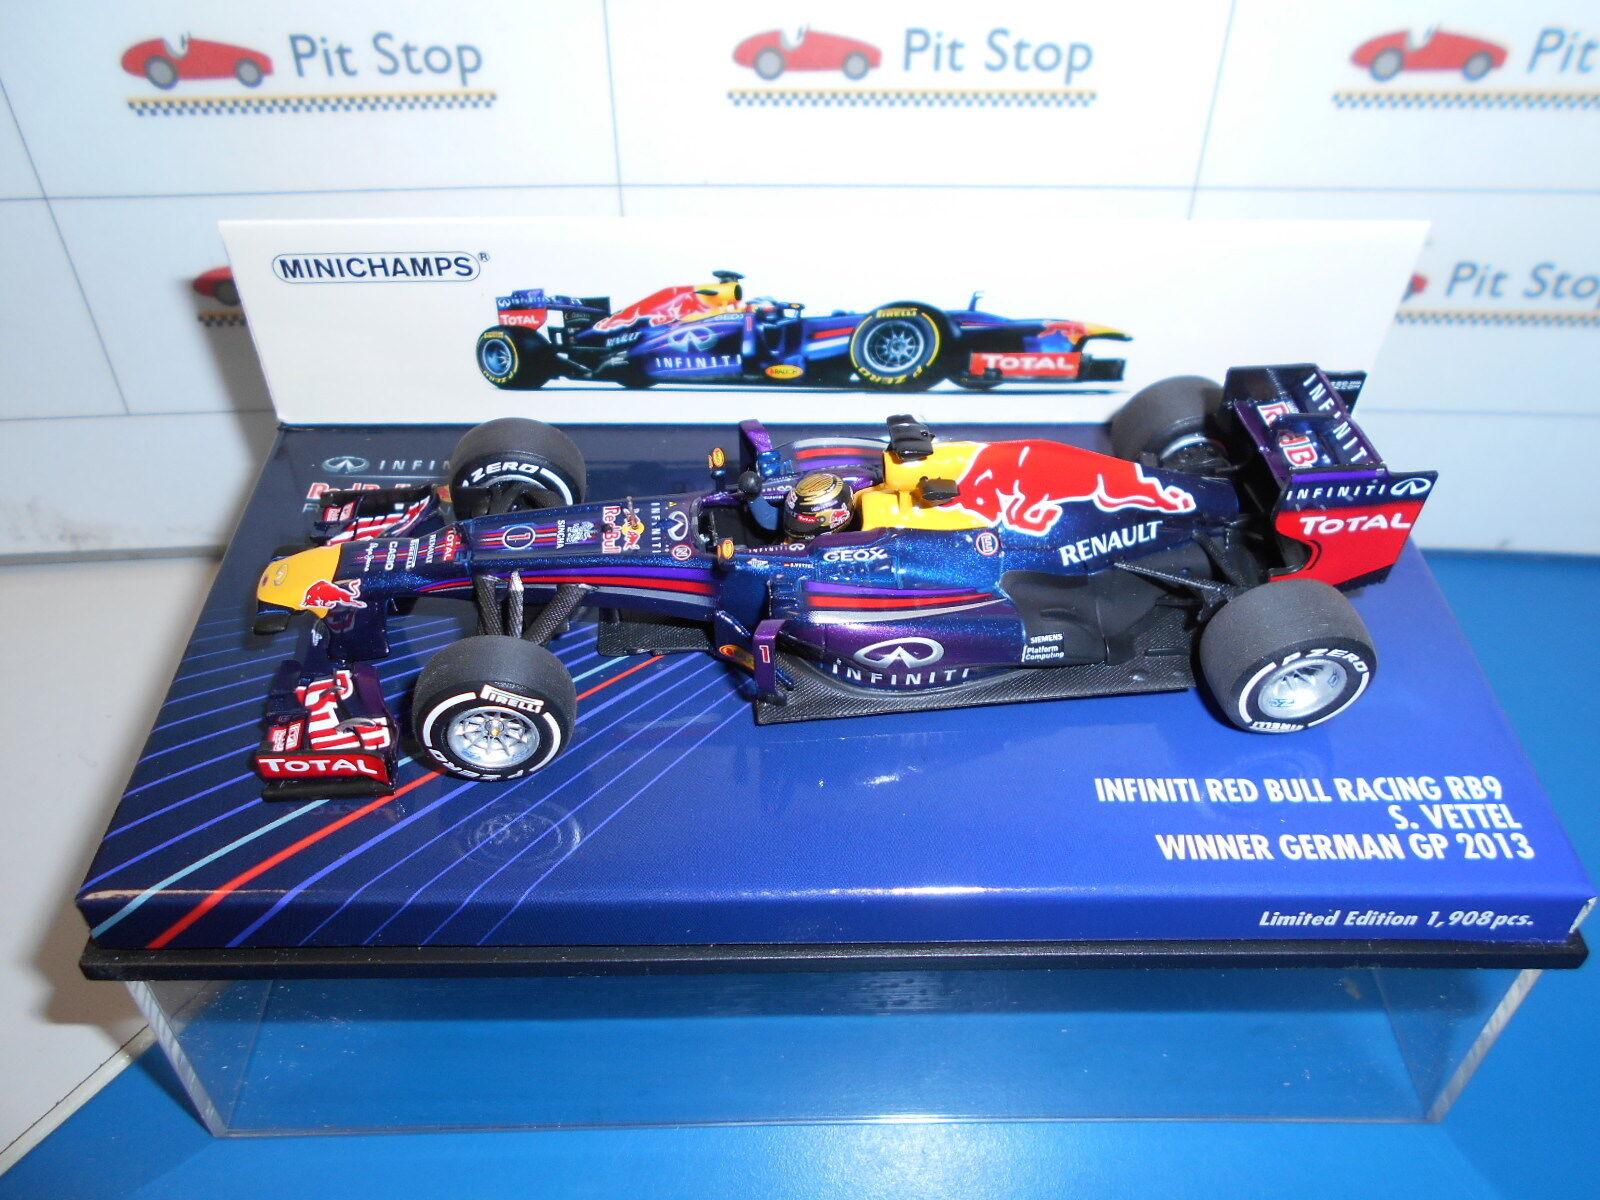 MIN410130101 INFINITI rouge BULL RACING RB9 VETTEL WINNER GERMAN GP 2013 1 43